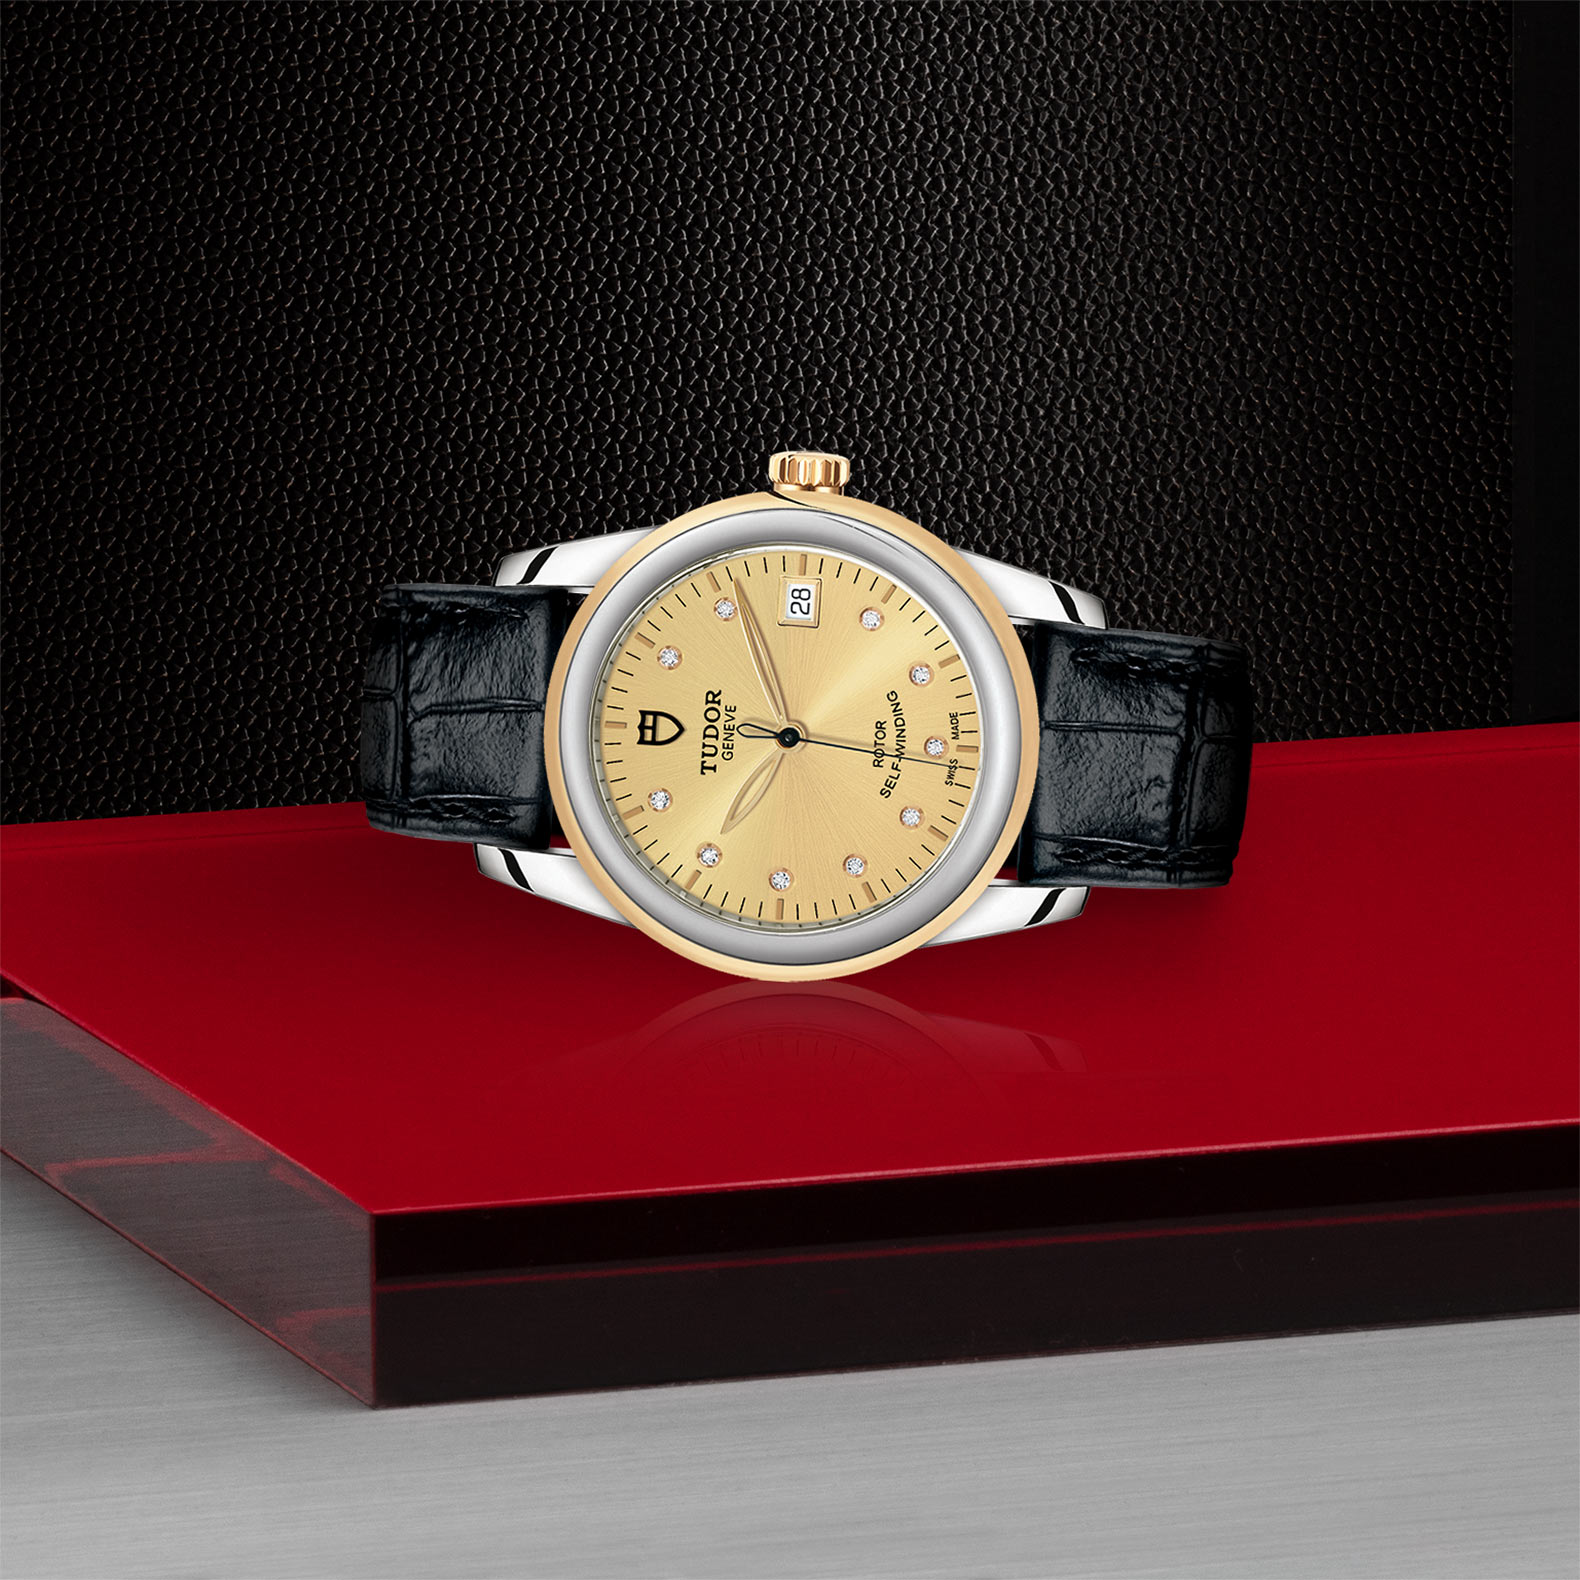 TUDOR Glamour Date - M55003-0051